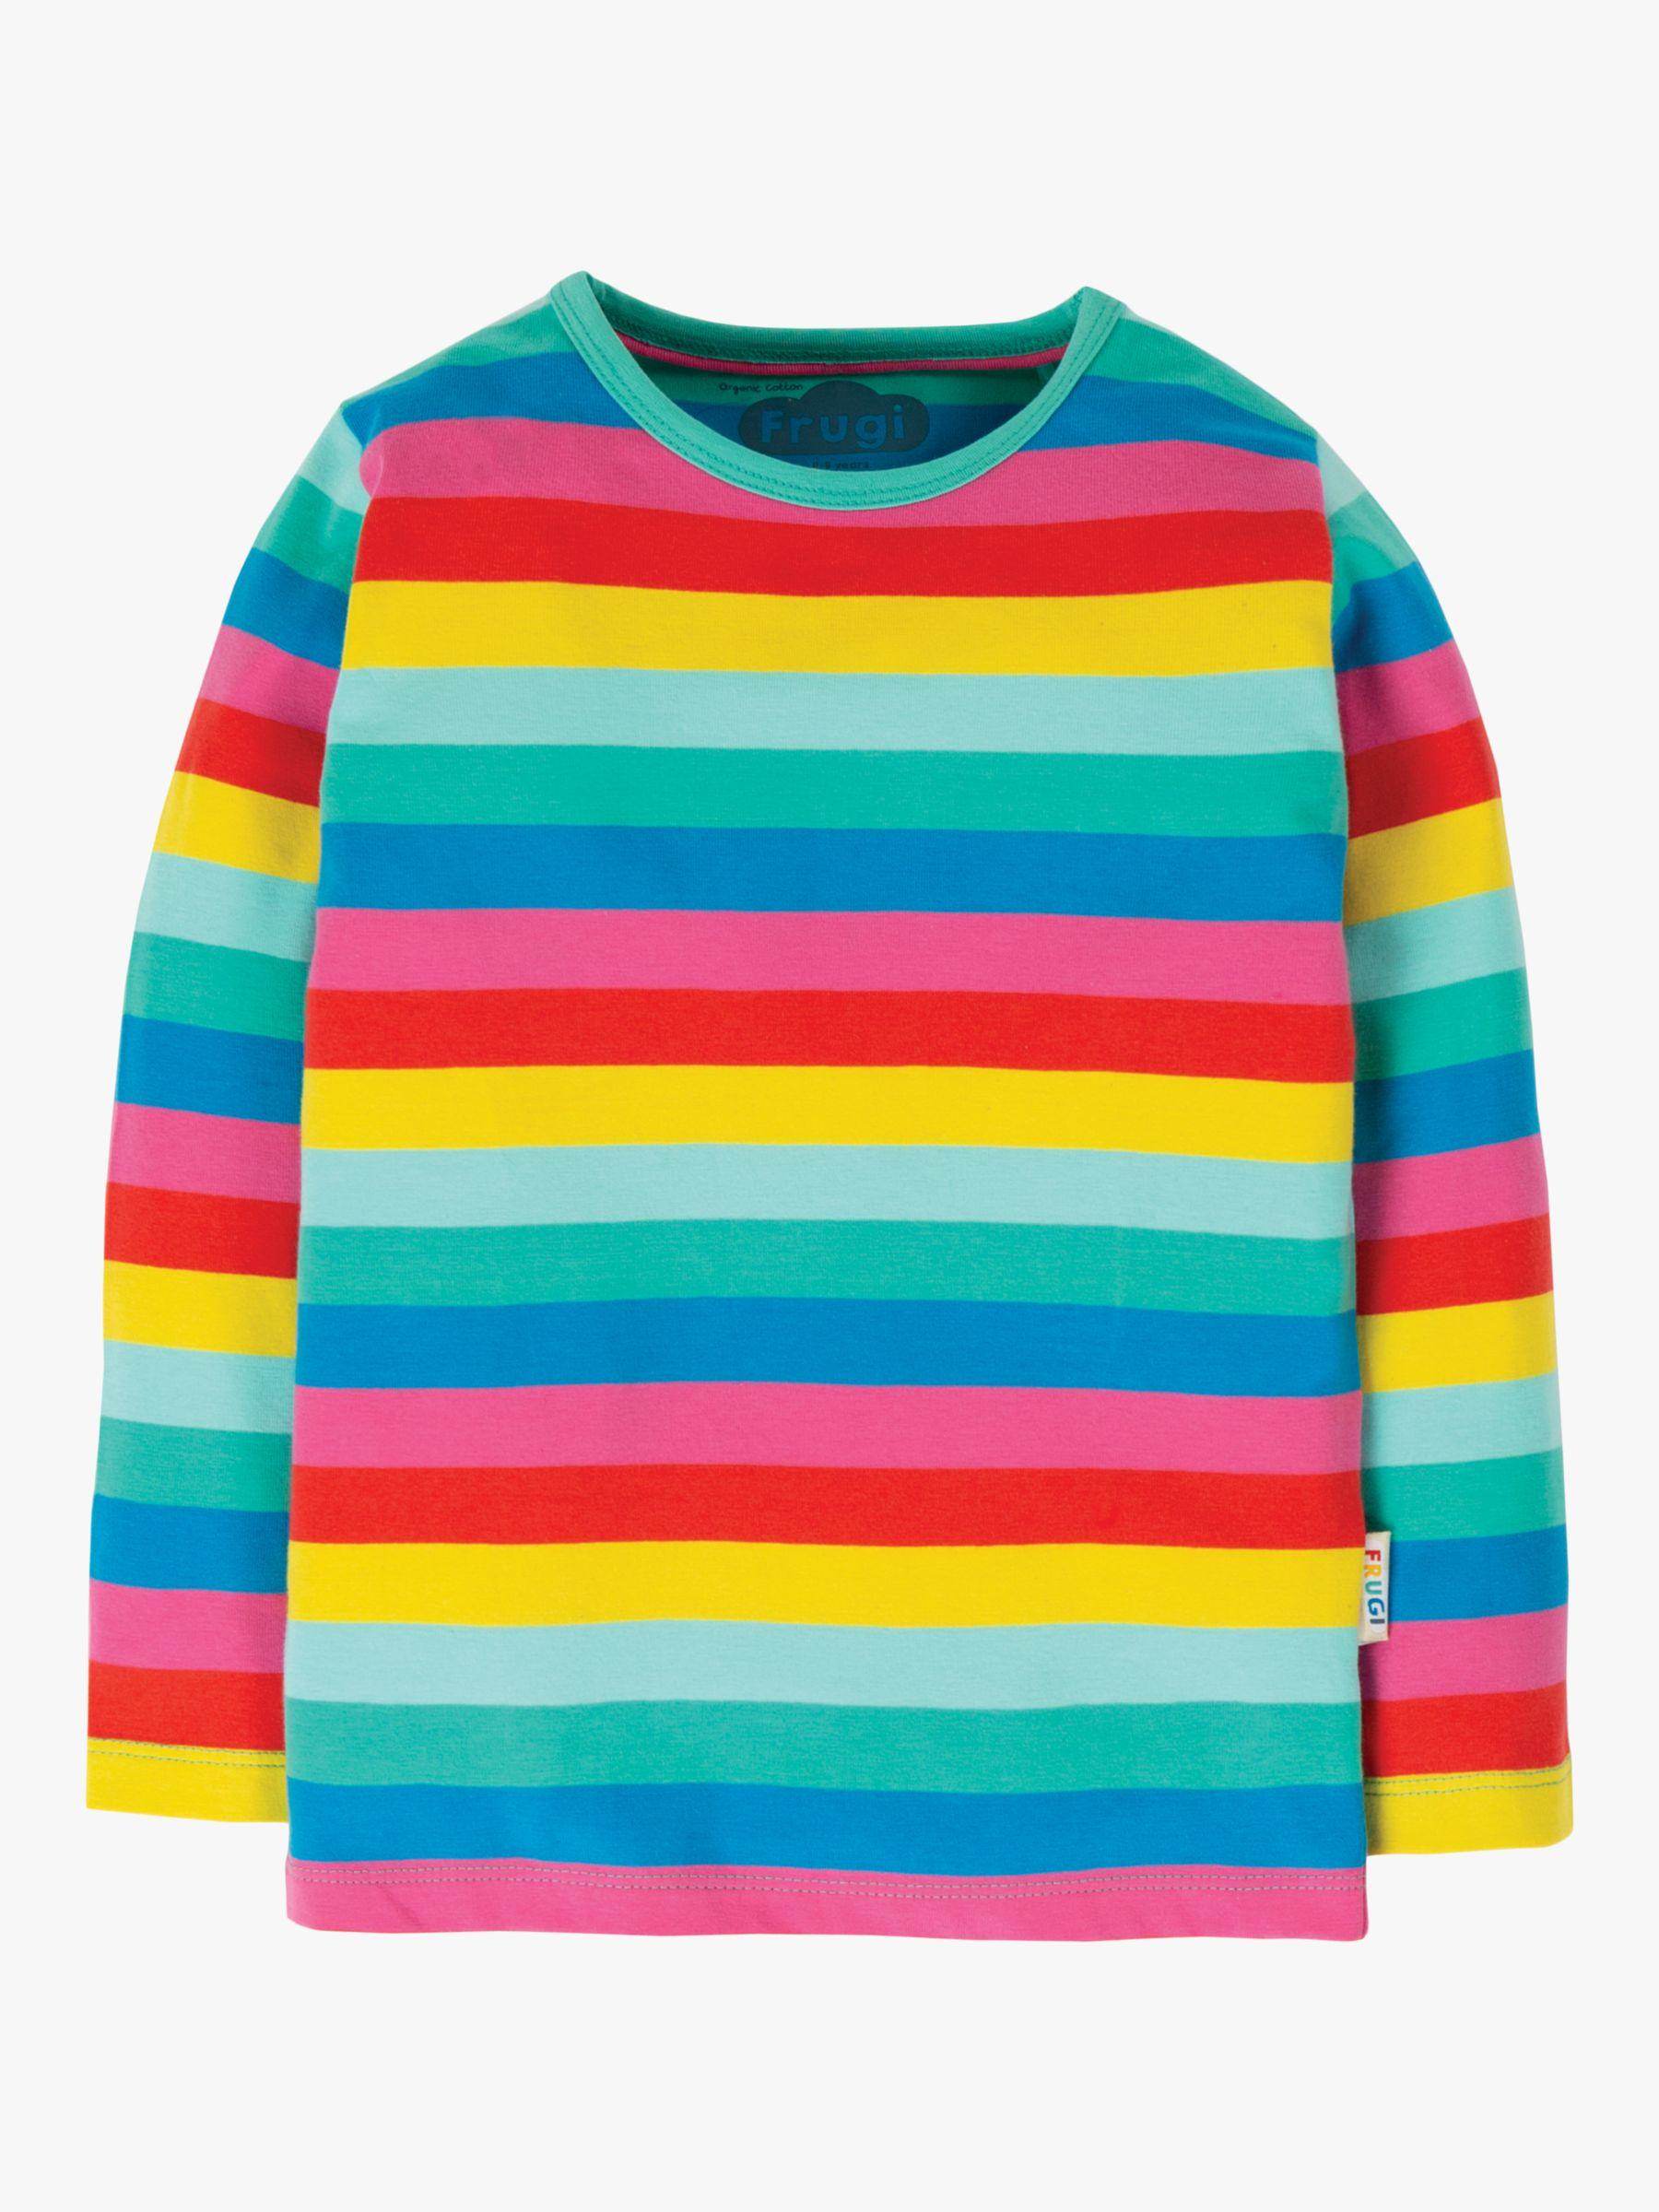 Frugi Frugi Children's GOTS Organic Cotton Long Sleeve Rainbow Top, Multi